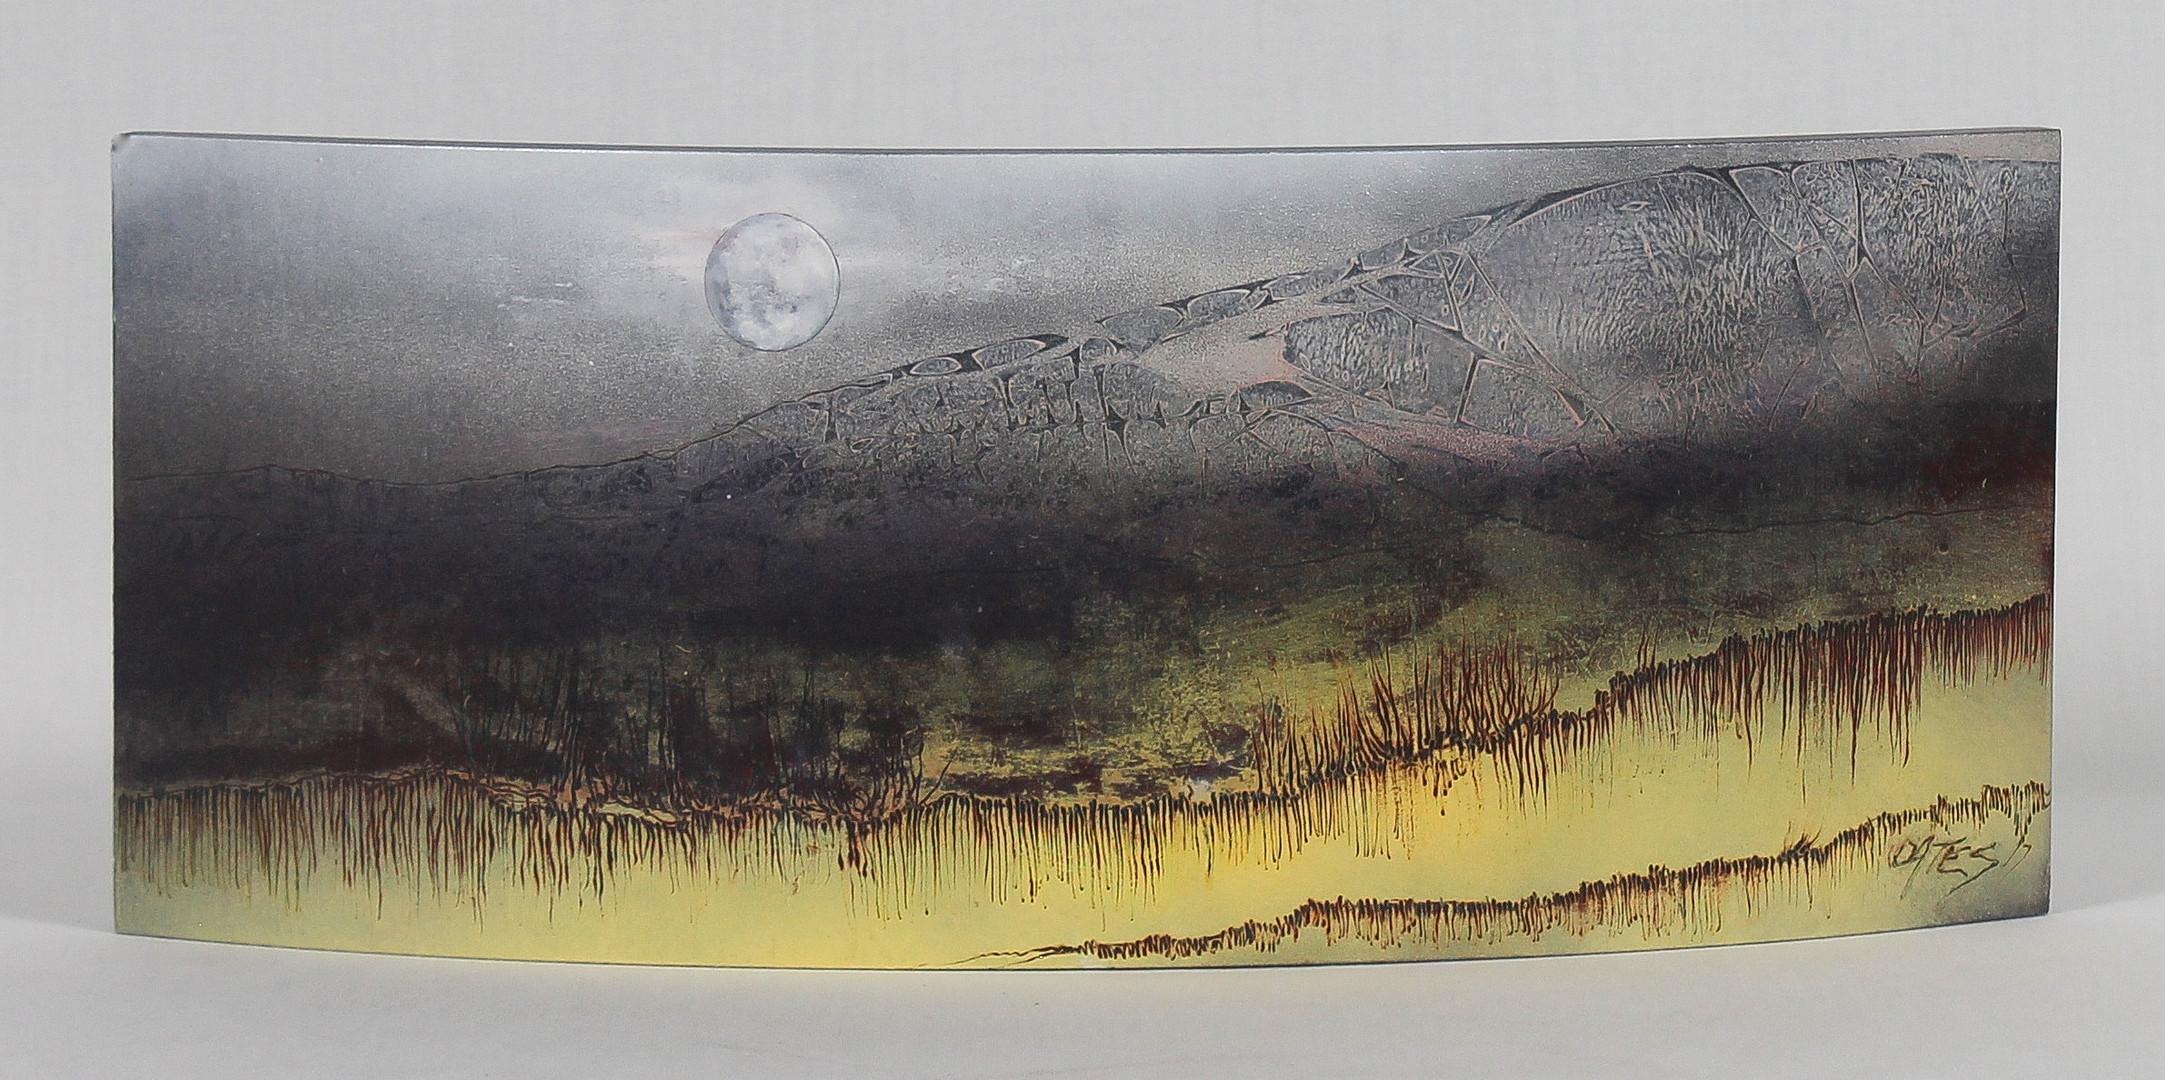 Medium Table Art 55 x 19cm SIDE A 'End o